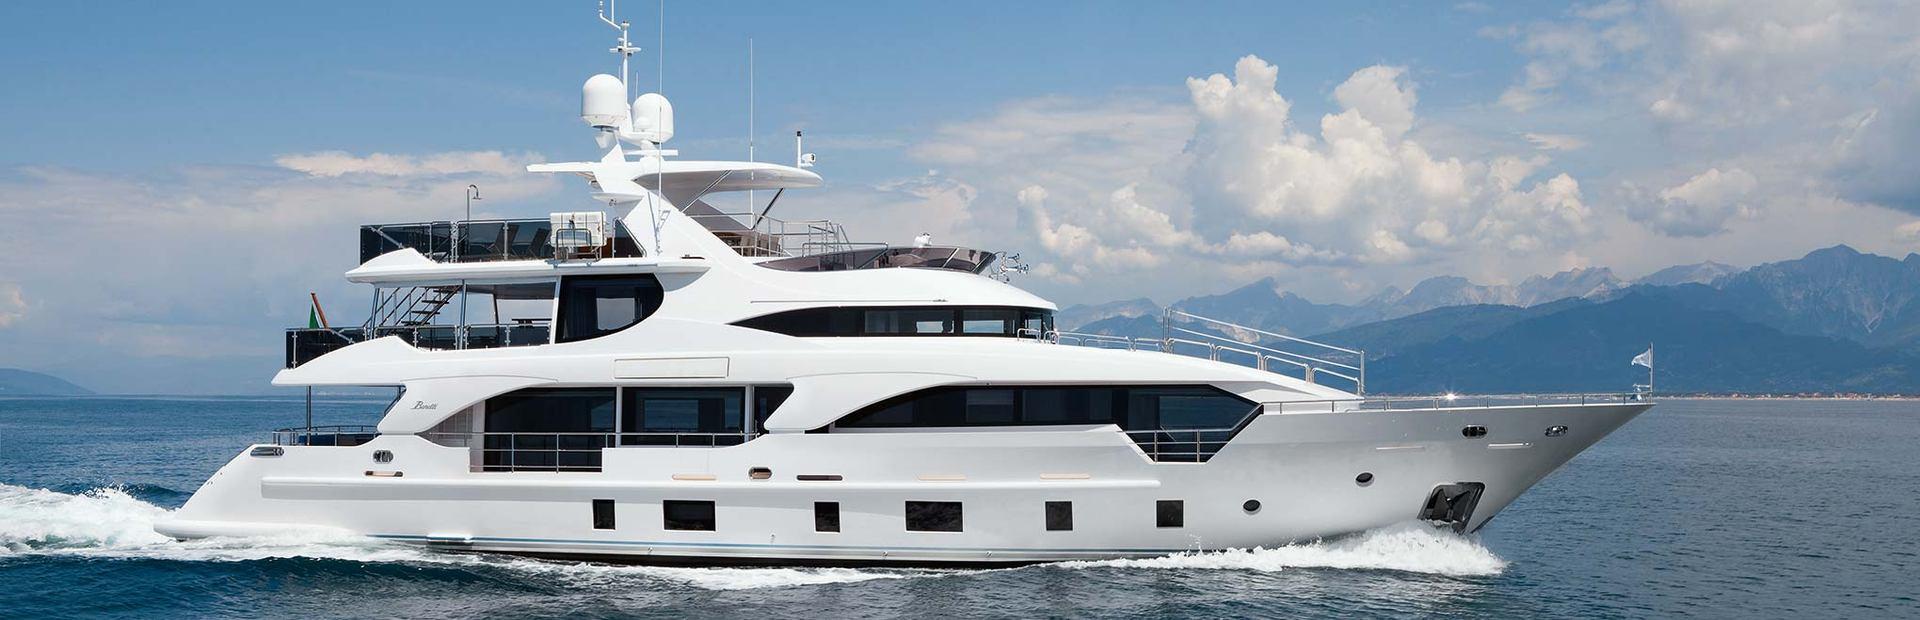 Supreme 108 Yacht Charter